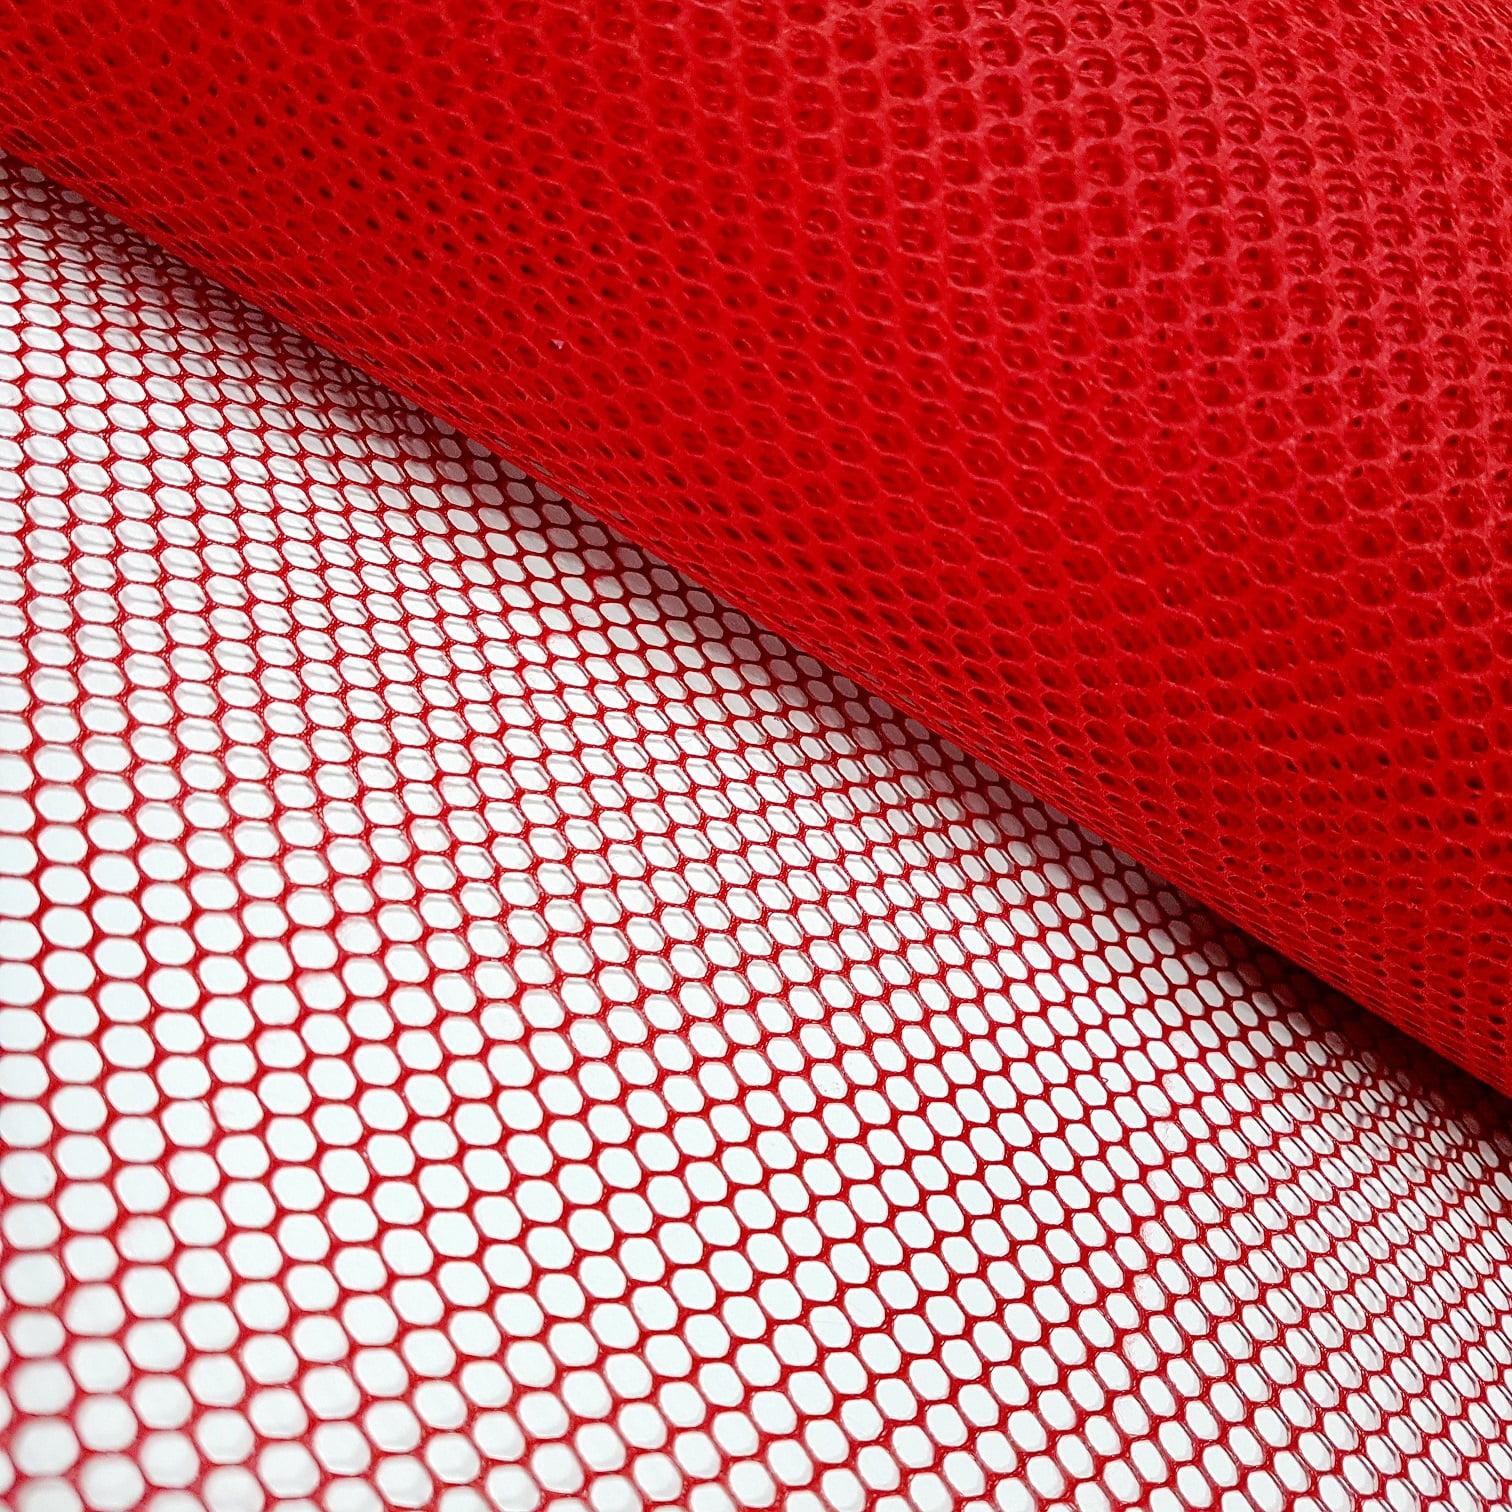 Tela Voley Vermelha